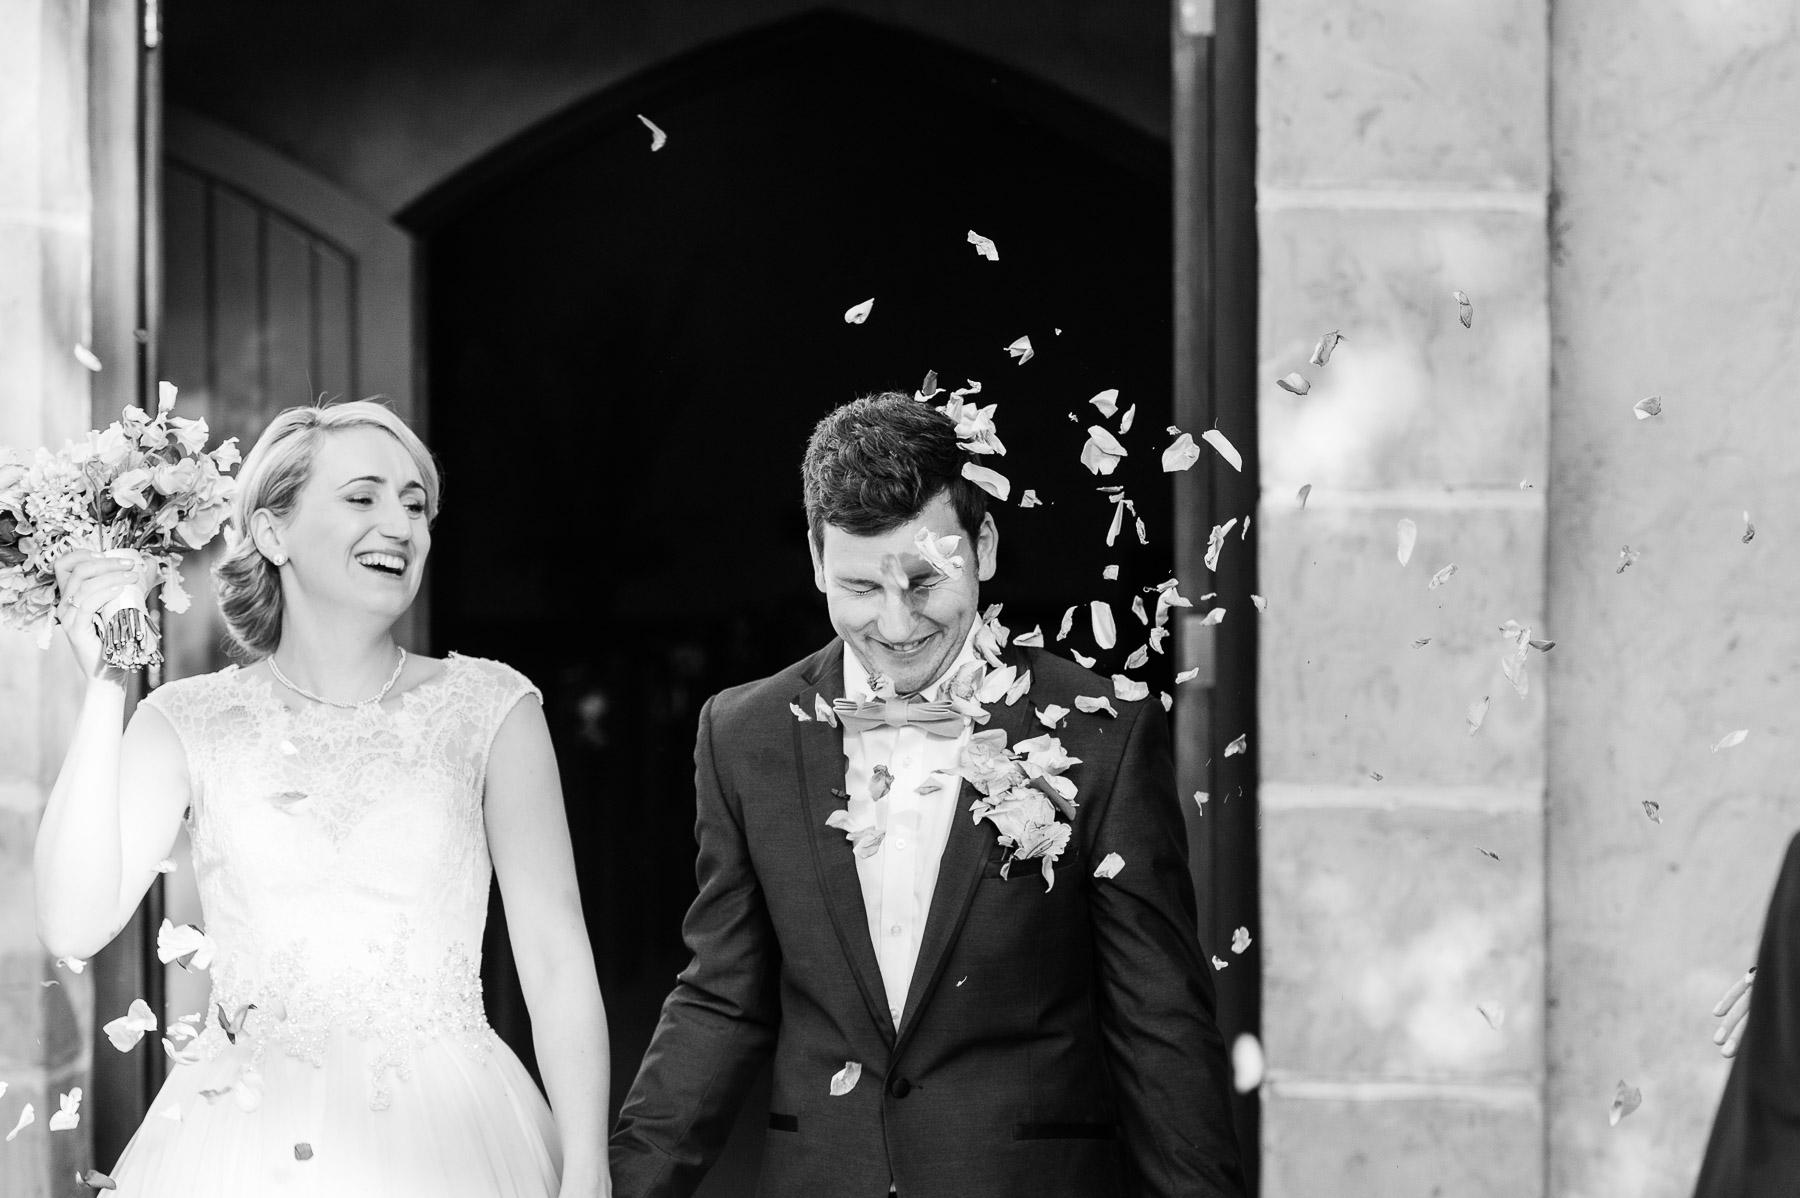 Marnie_and_Charlie_Yarra_Valley_Wedding_Blog-58.jpg